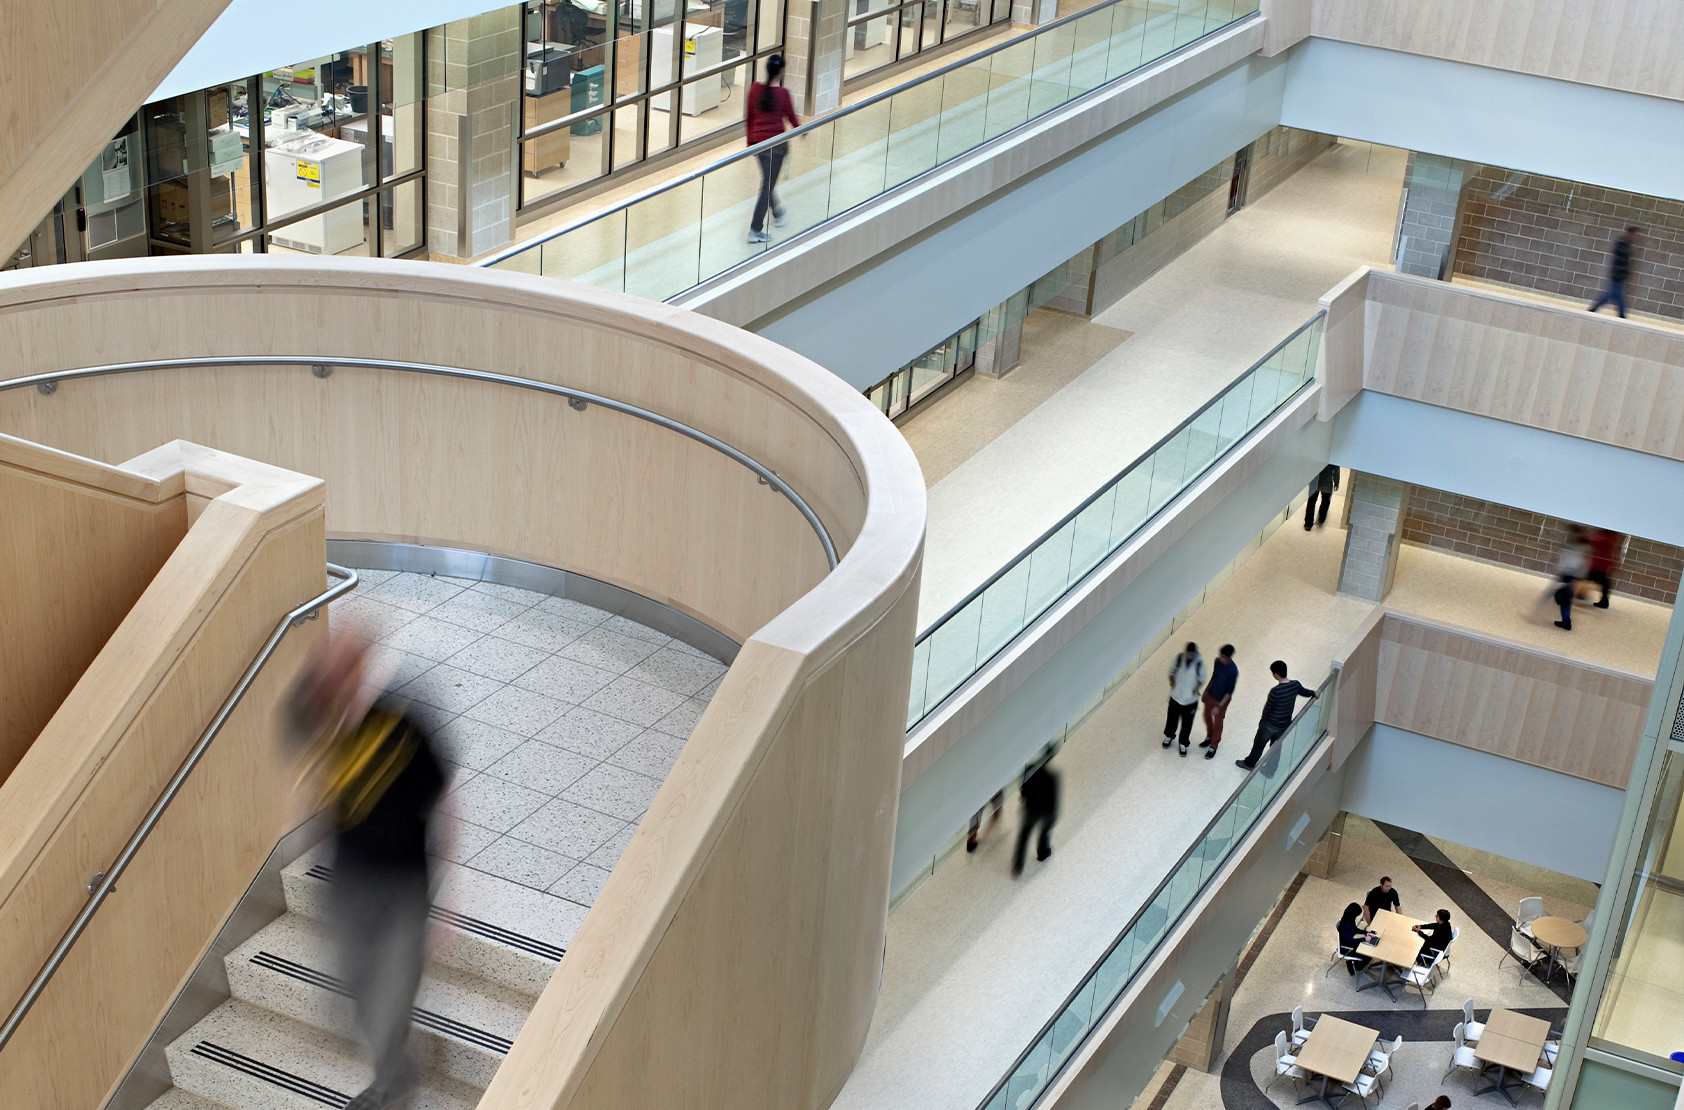 University of Saskatchewan - Academic Health Sciences Centre